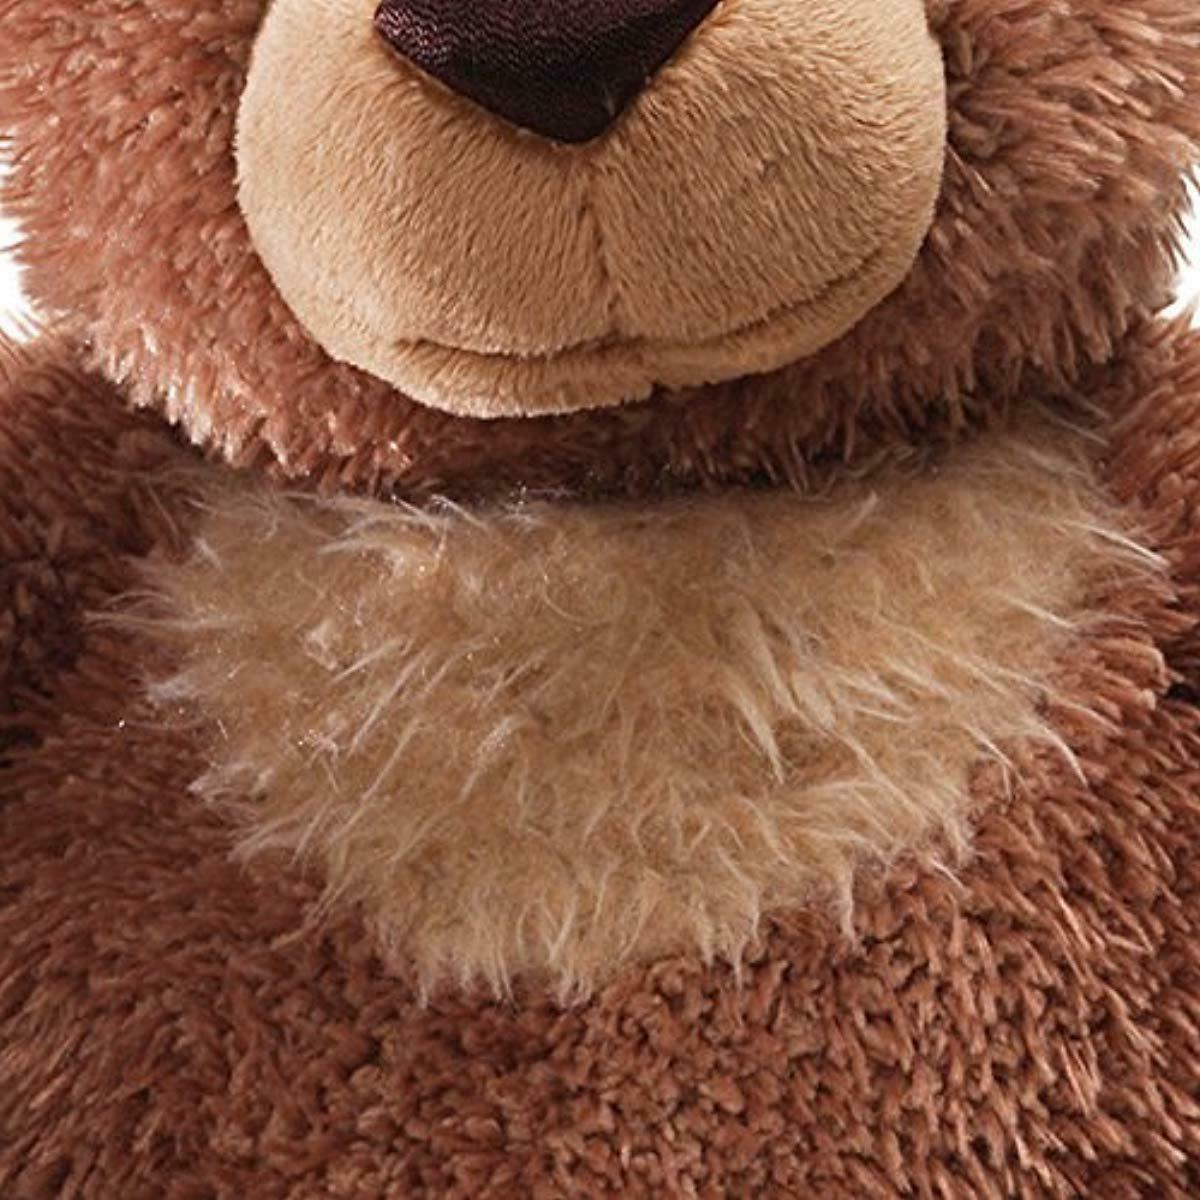 "GUND Slumbers Stuffed Plush, Brown, 17"""